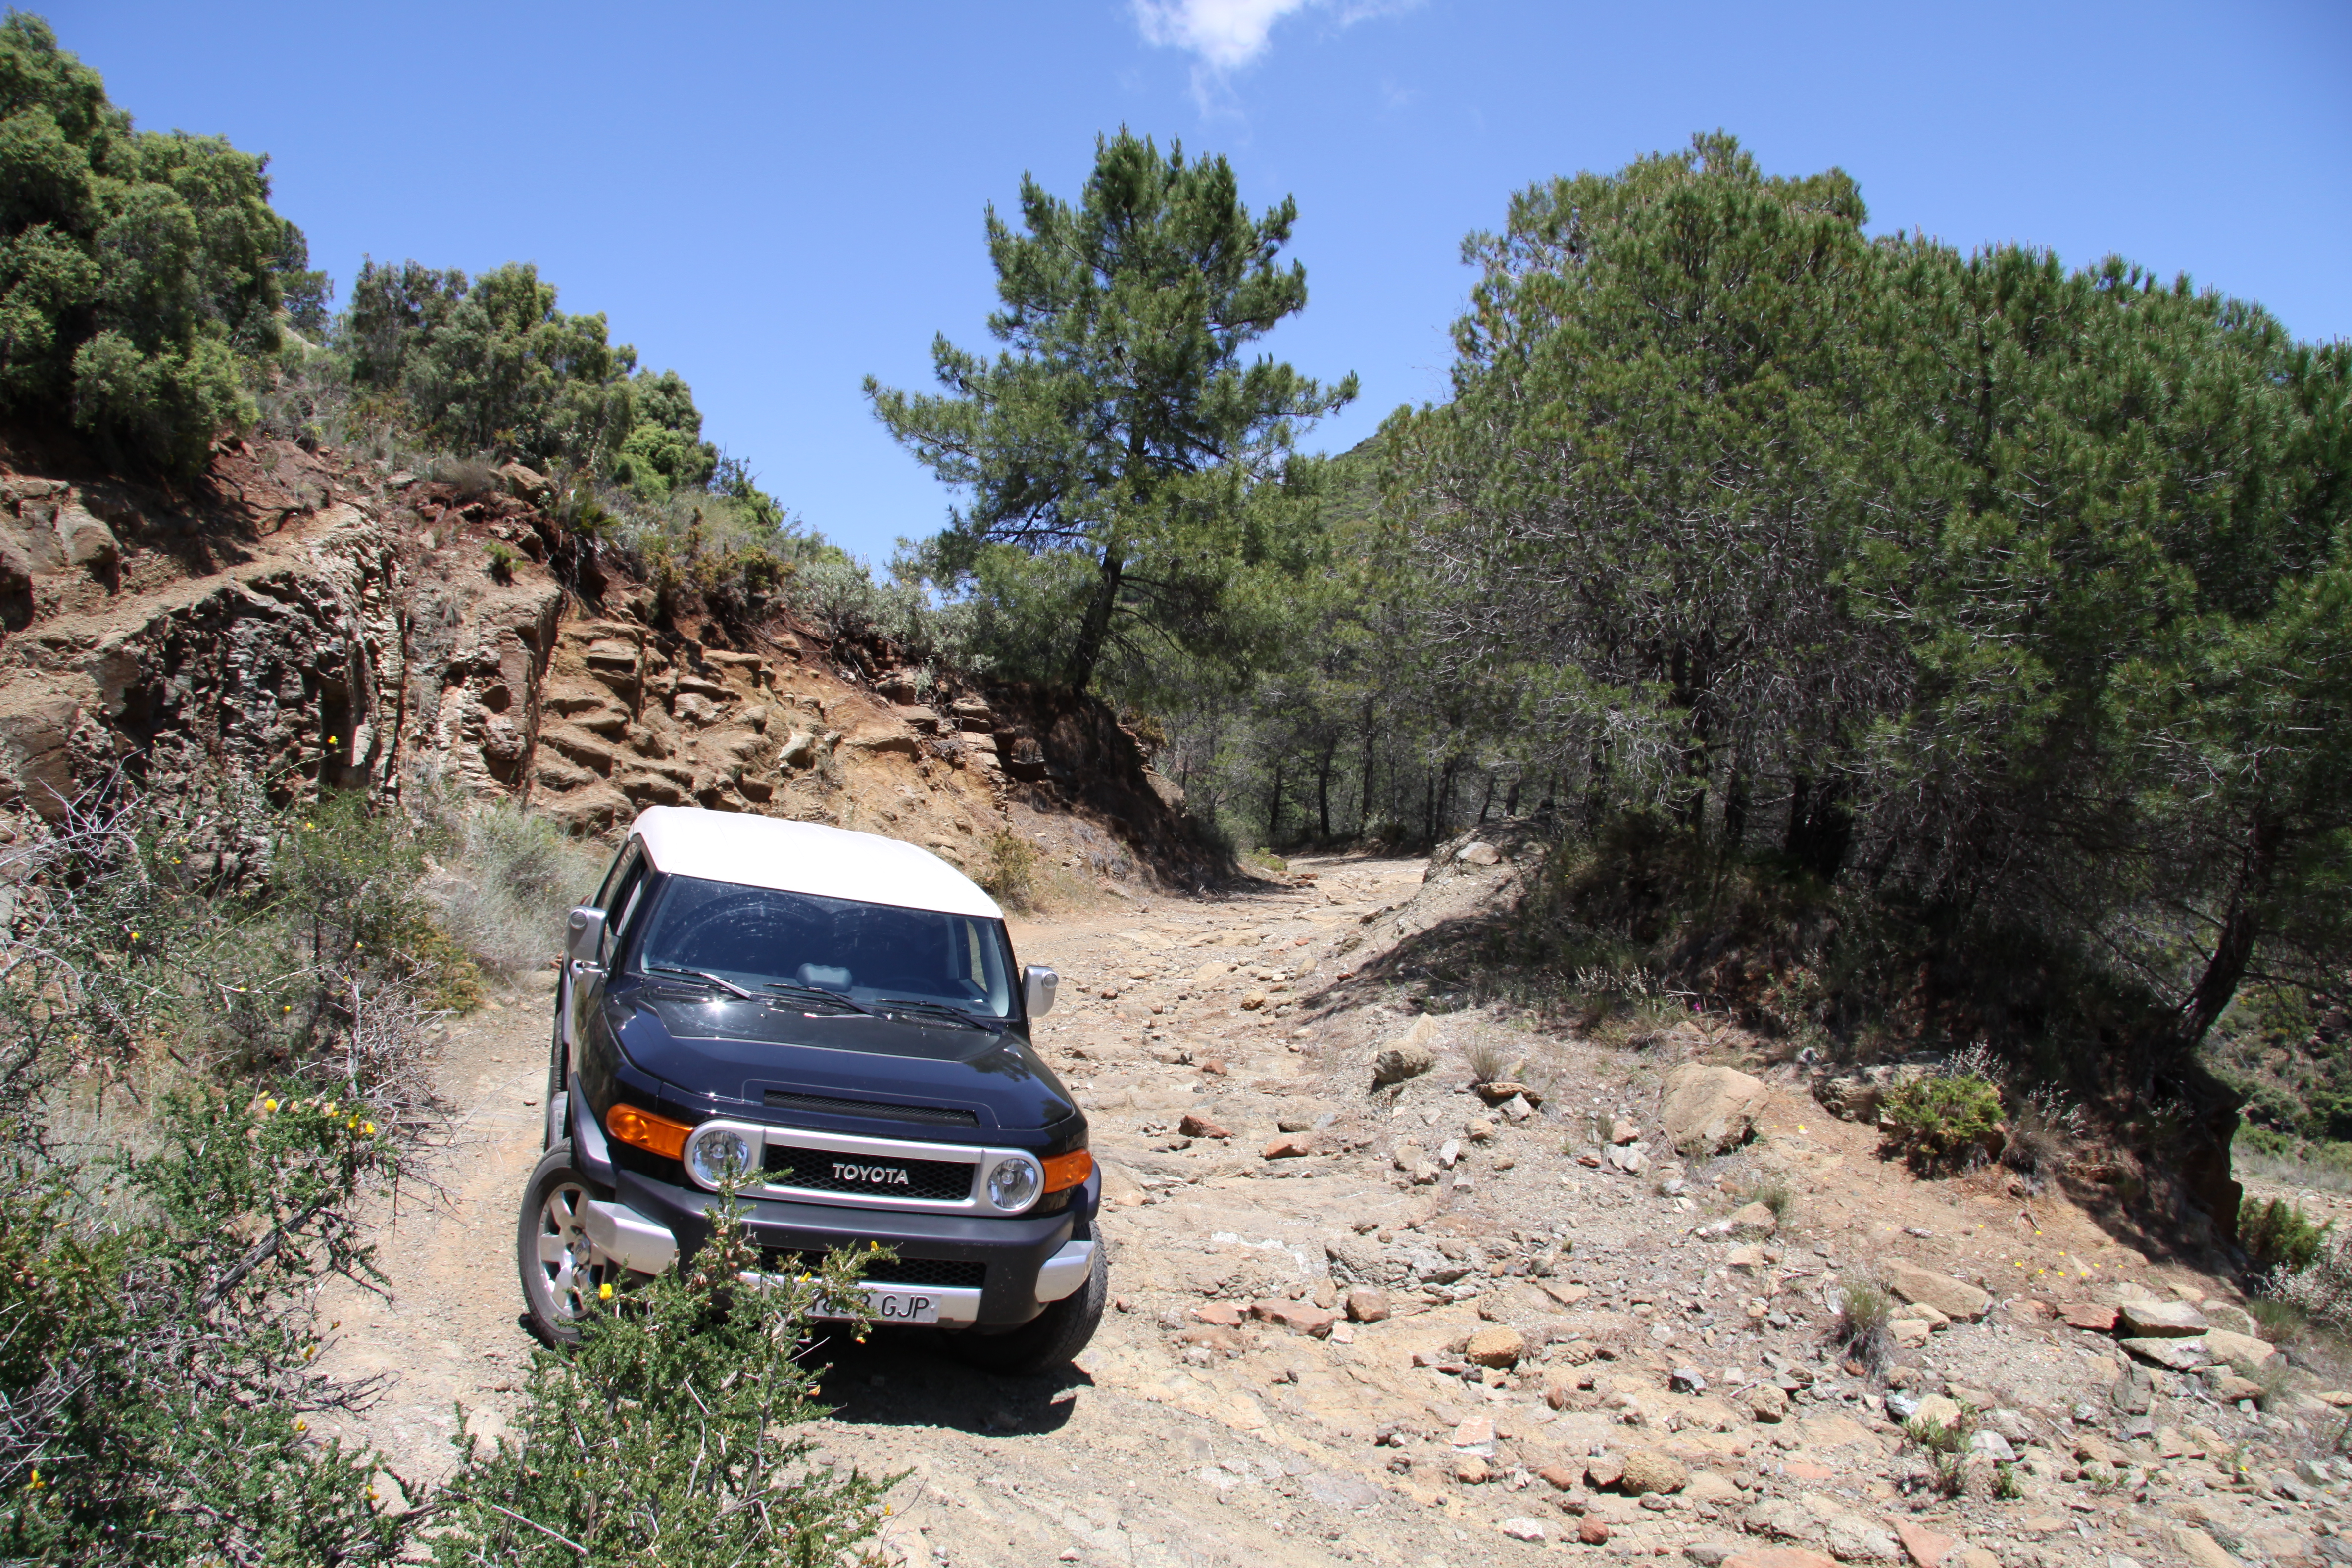 Exploring trails, La Mairena, Ojen, Andalucia